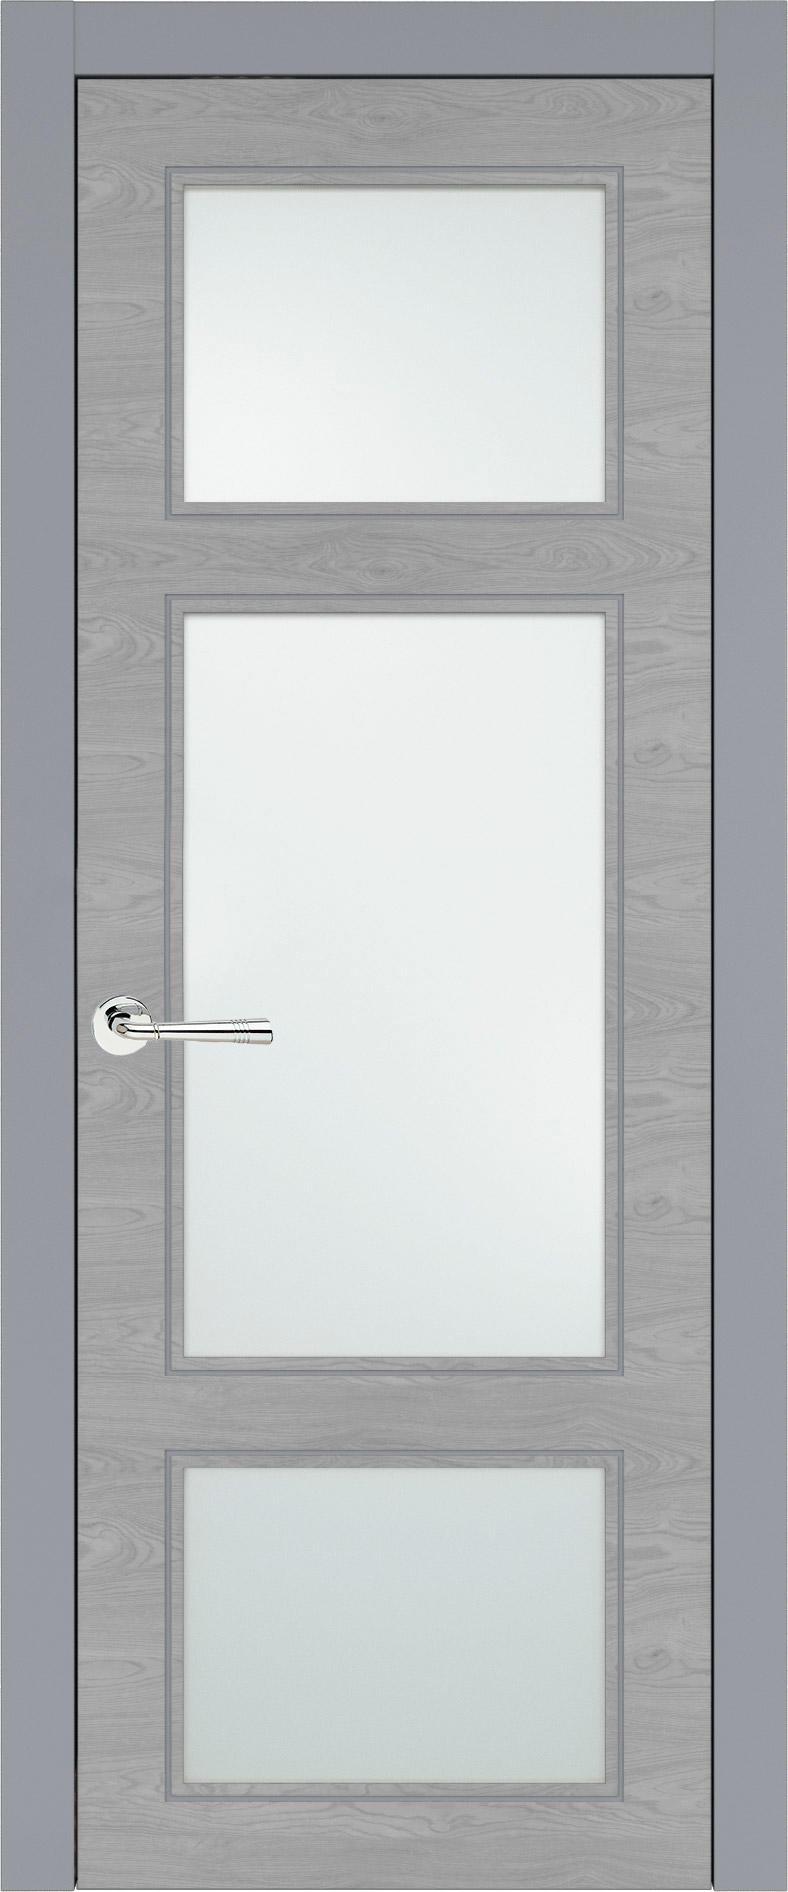 Siena Neo Classic цвет - Серебристо-серая эмаль по шпону (RAL 7045) Со стеклом (ДО)